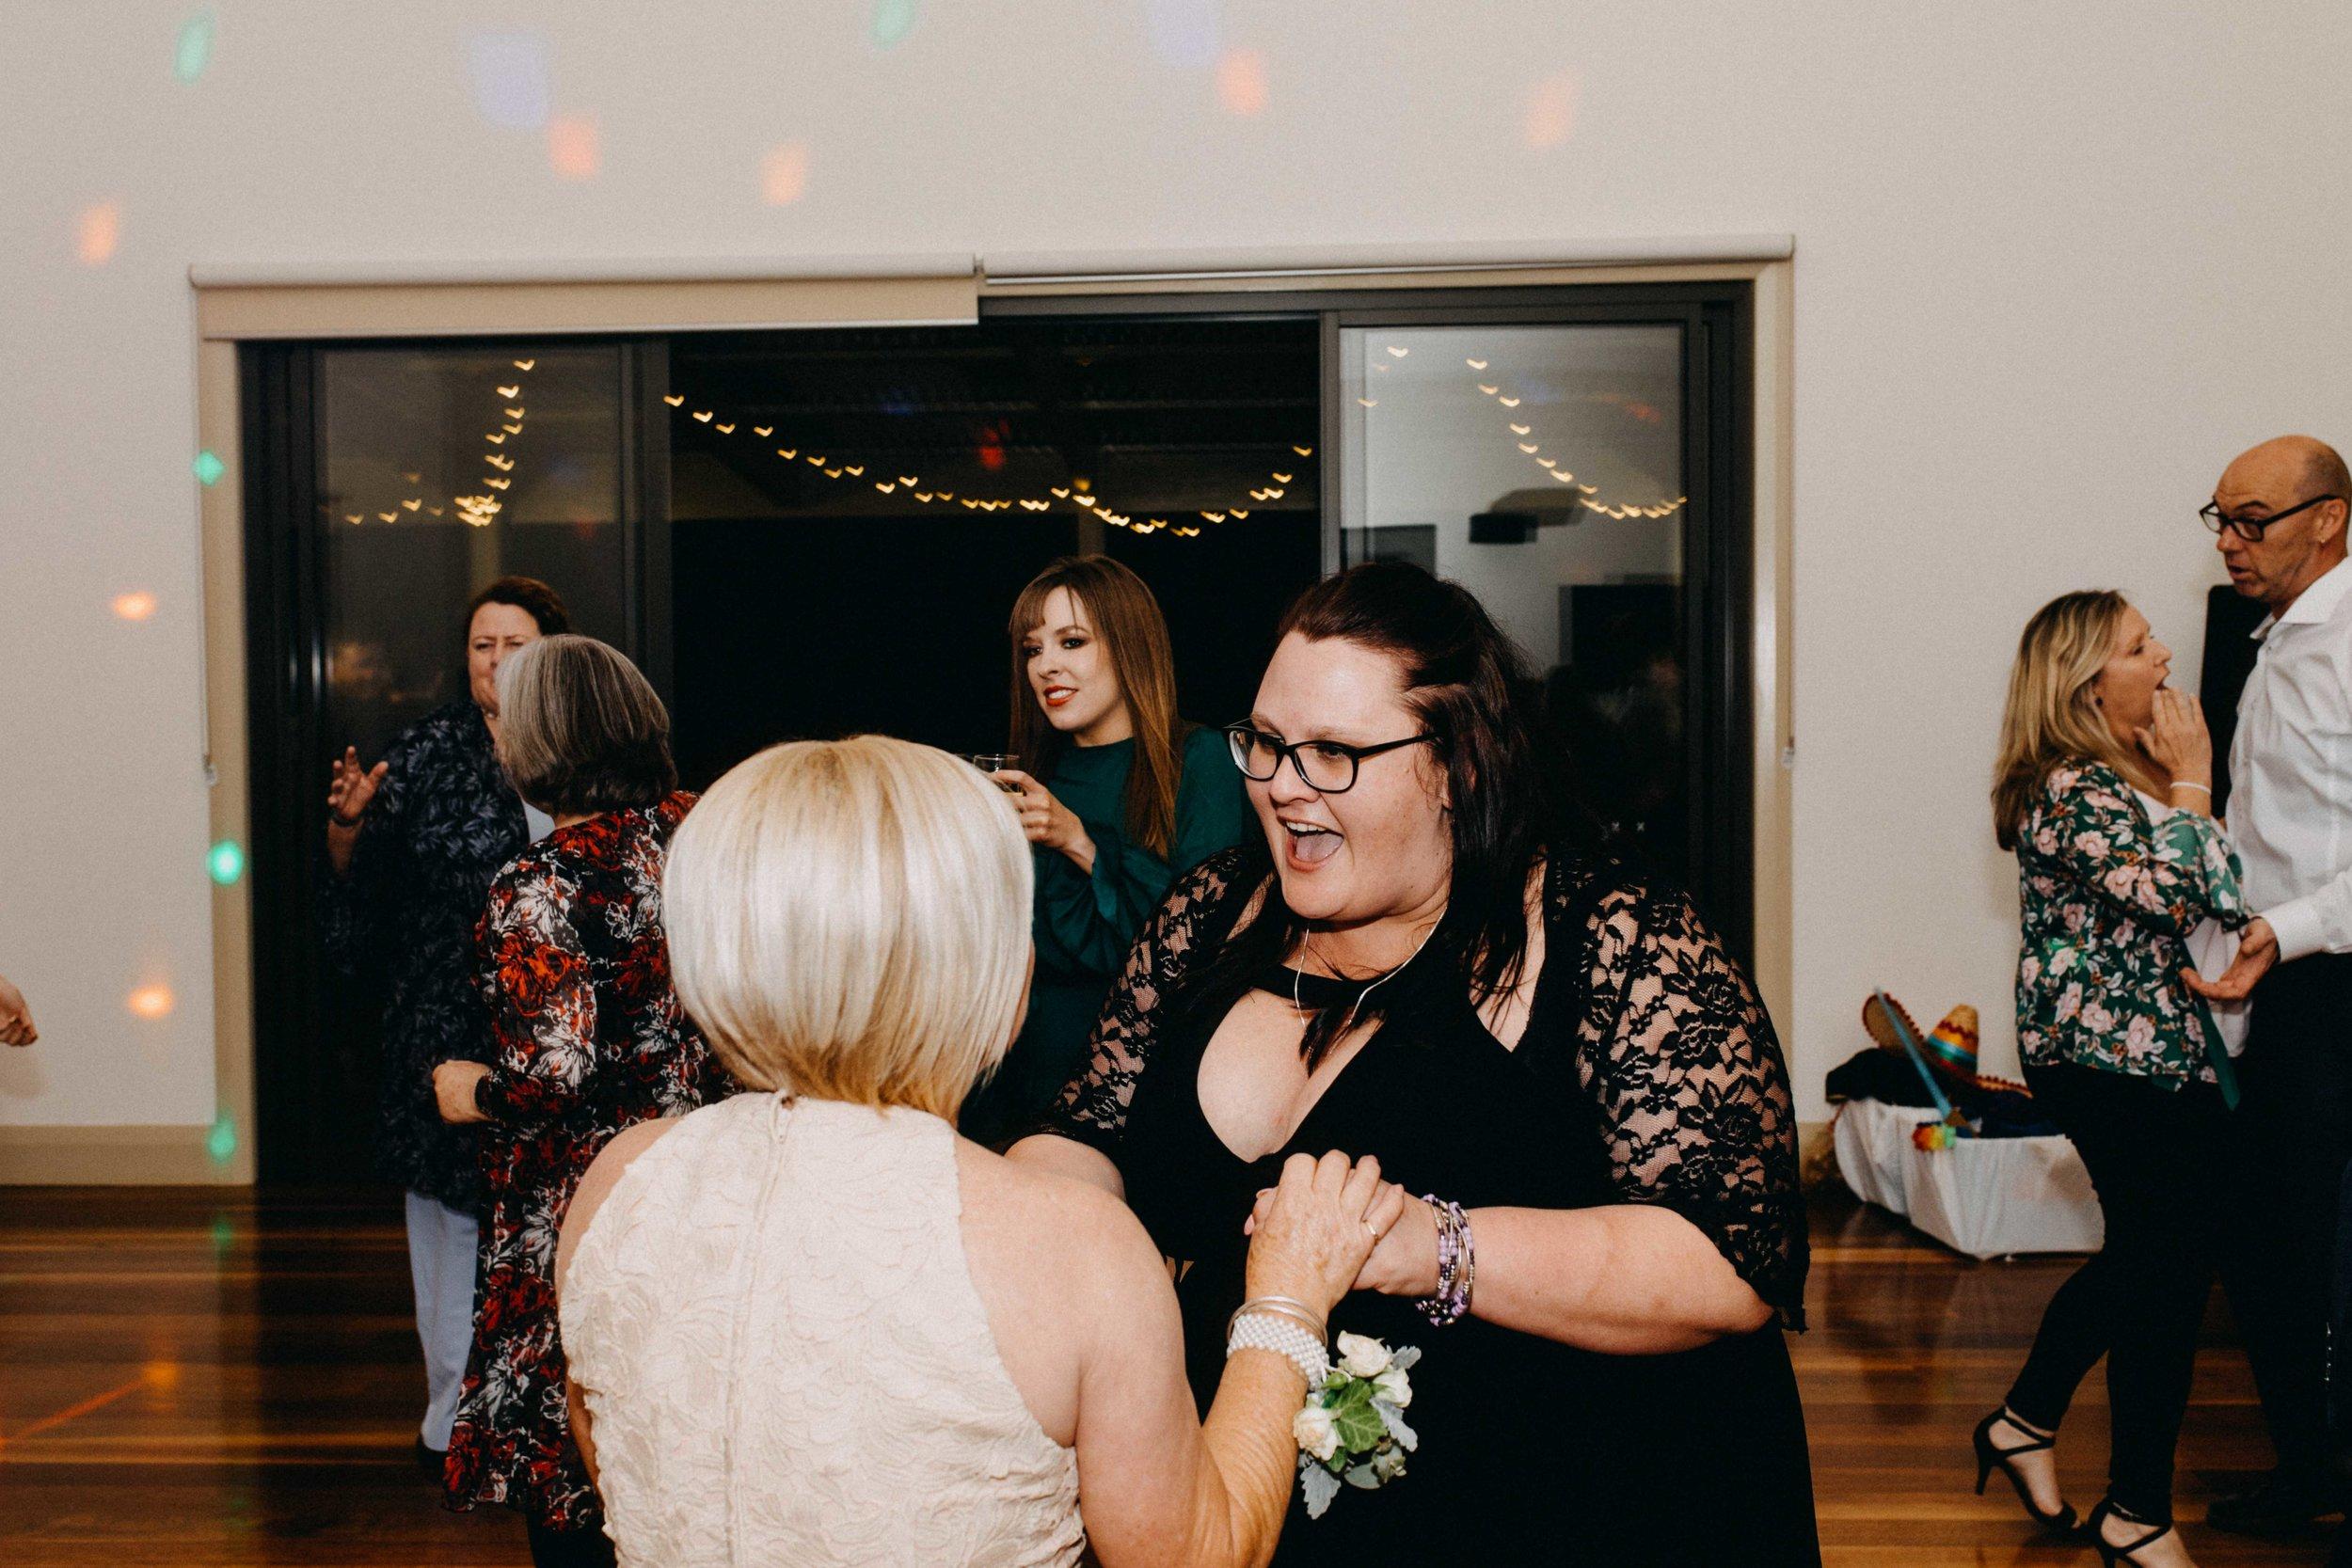 exeter-southern-highlands-wedding-www.emilyobrienphotography.net -150.jpg